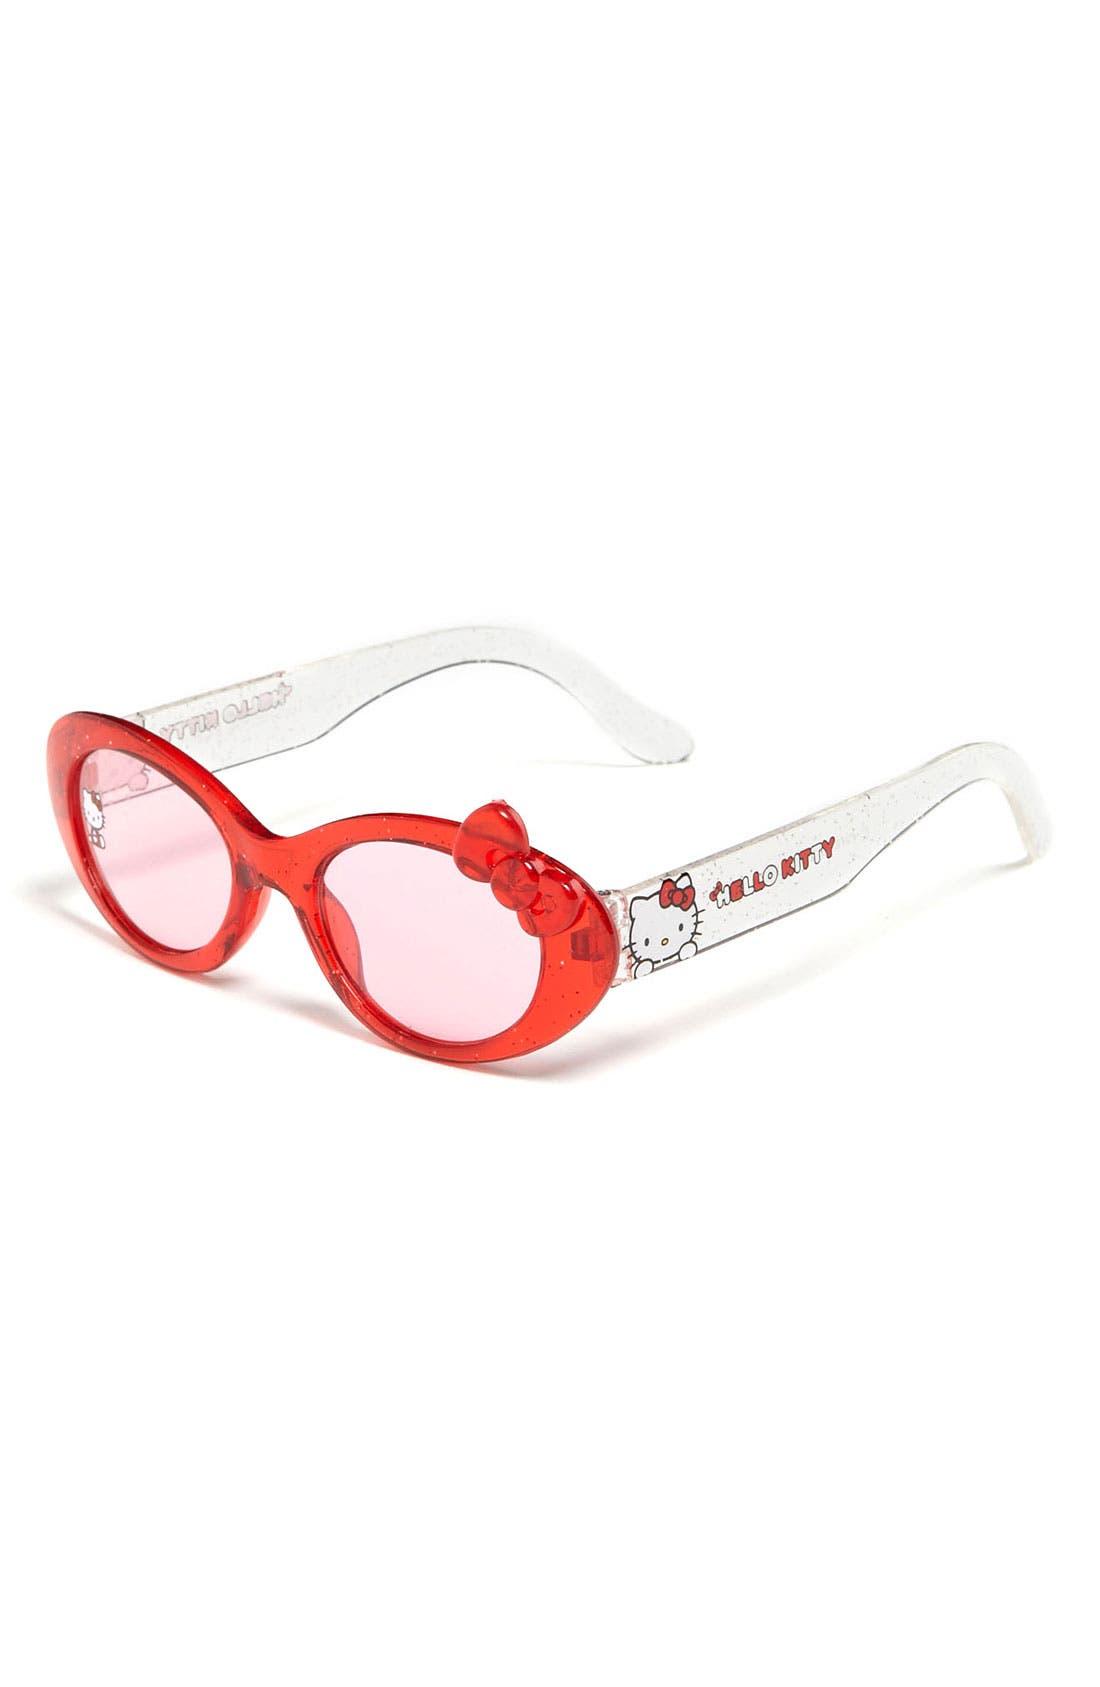 PAN OCEANIC EYEWEAR 'Hello Kitty<sup>®</sup>' Sunglasses, Main, color, 600